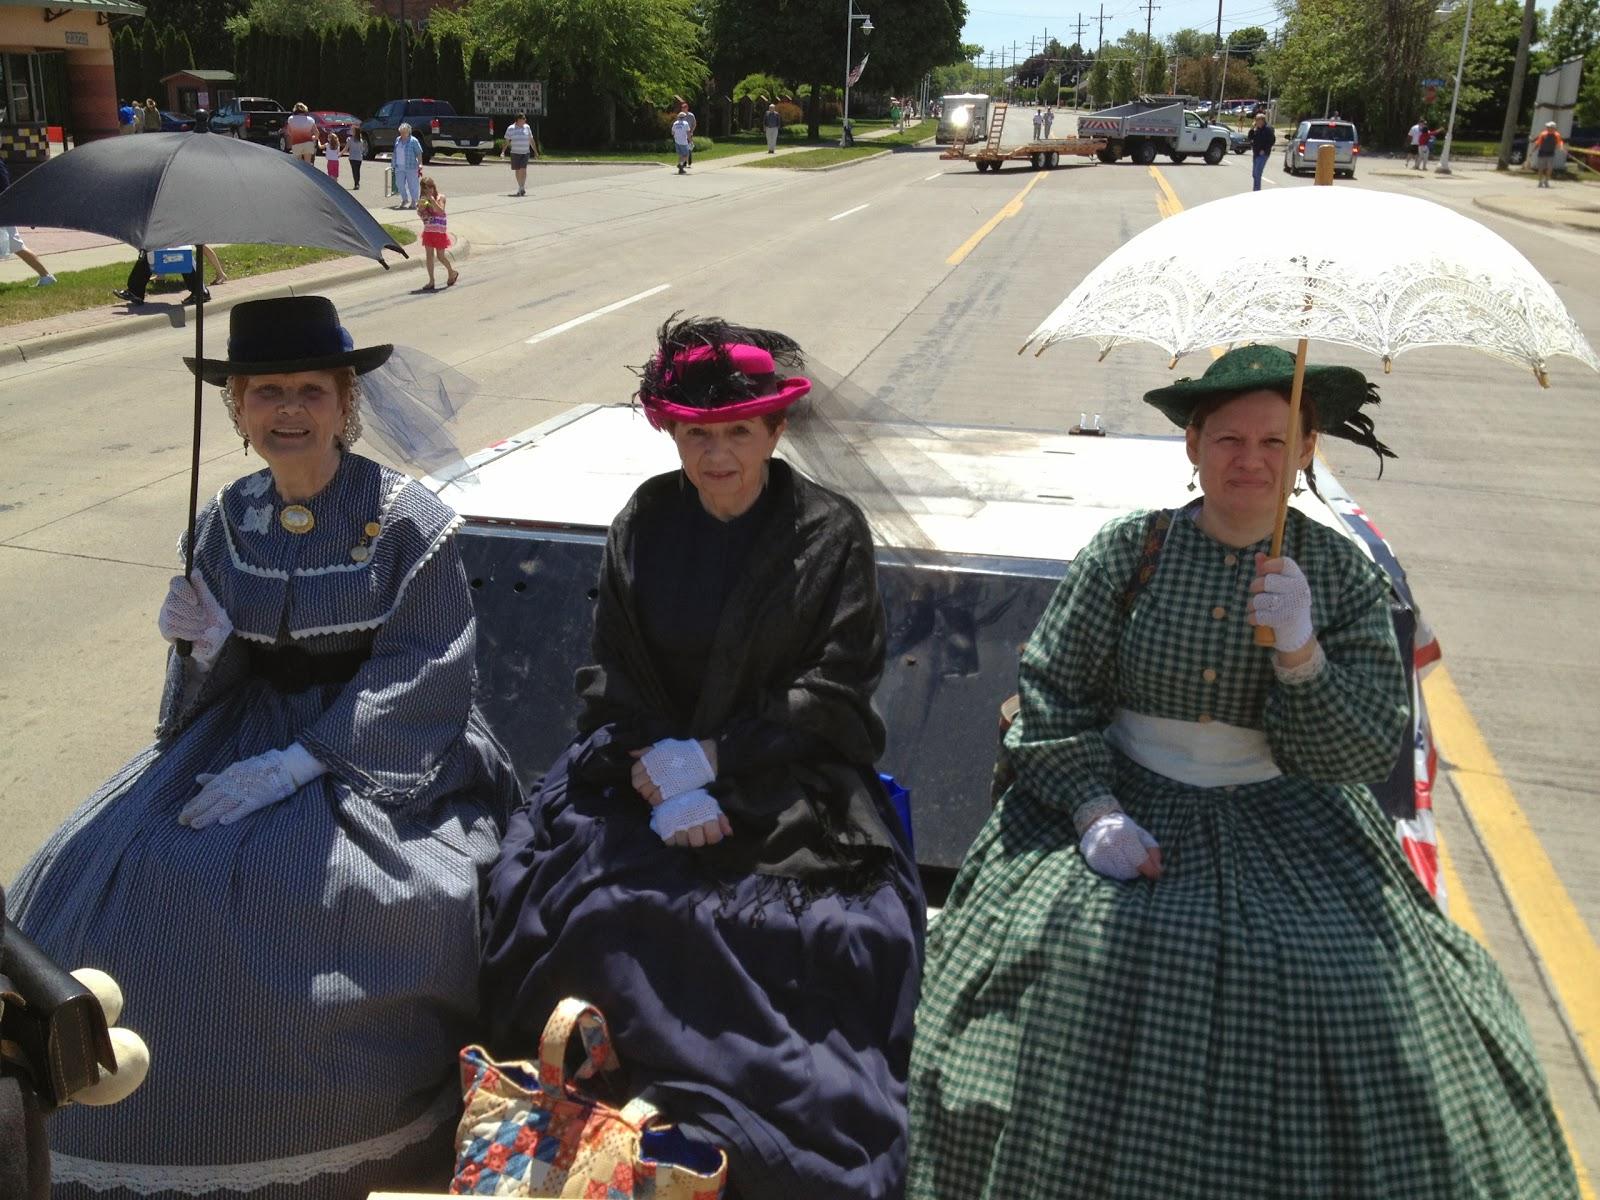 5th MI St Clair Shores MI Parade